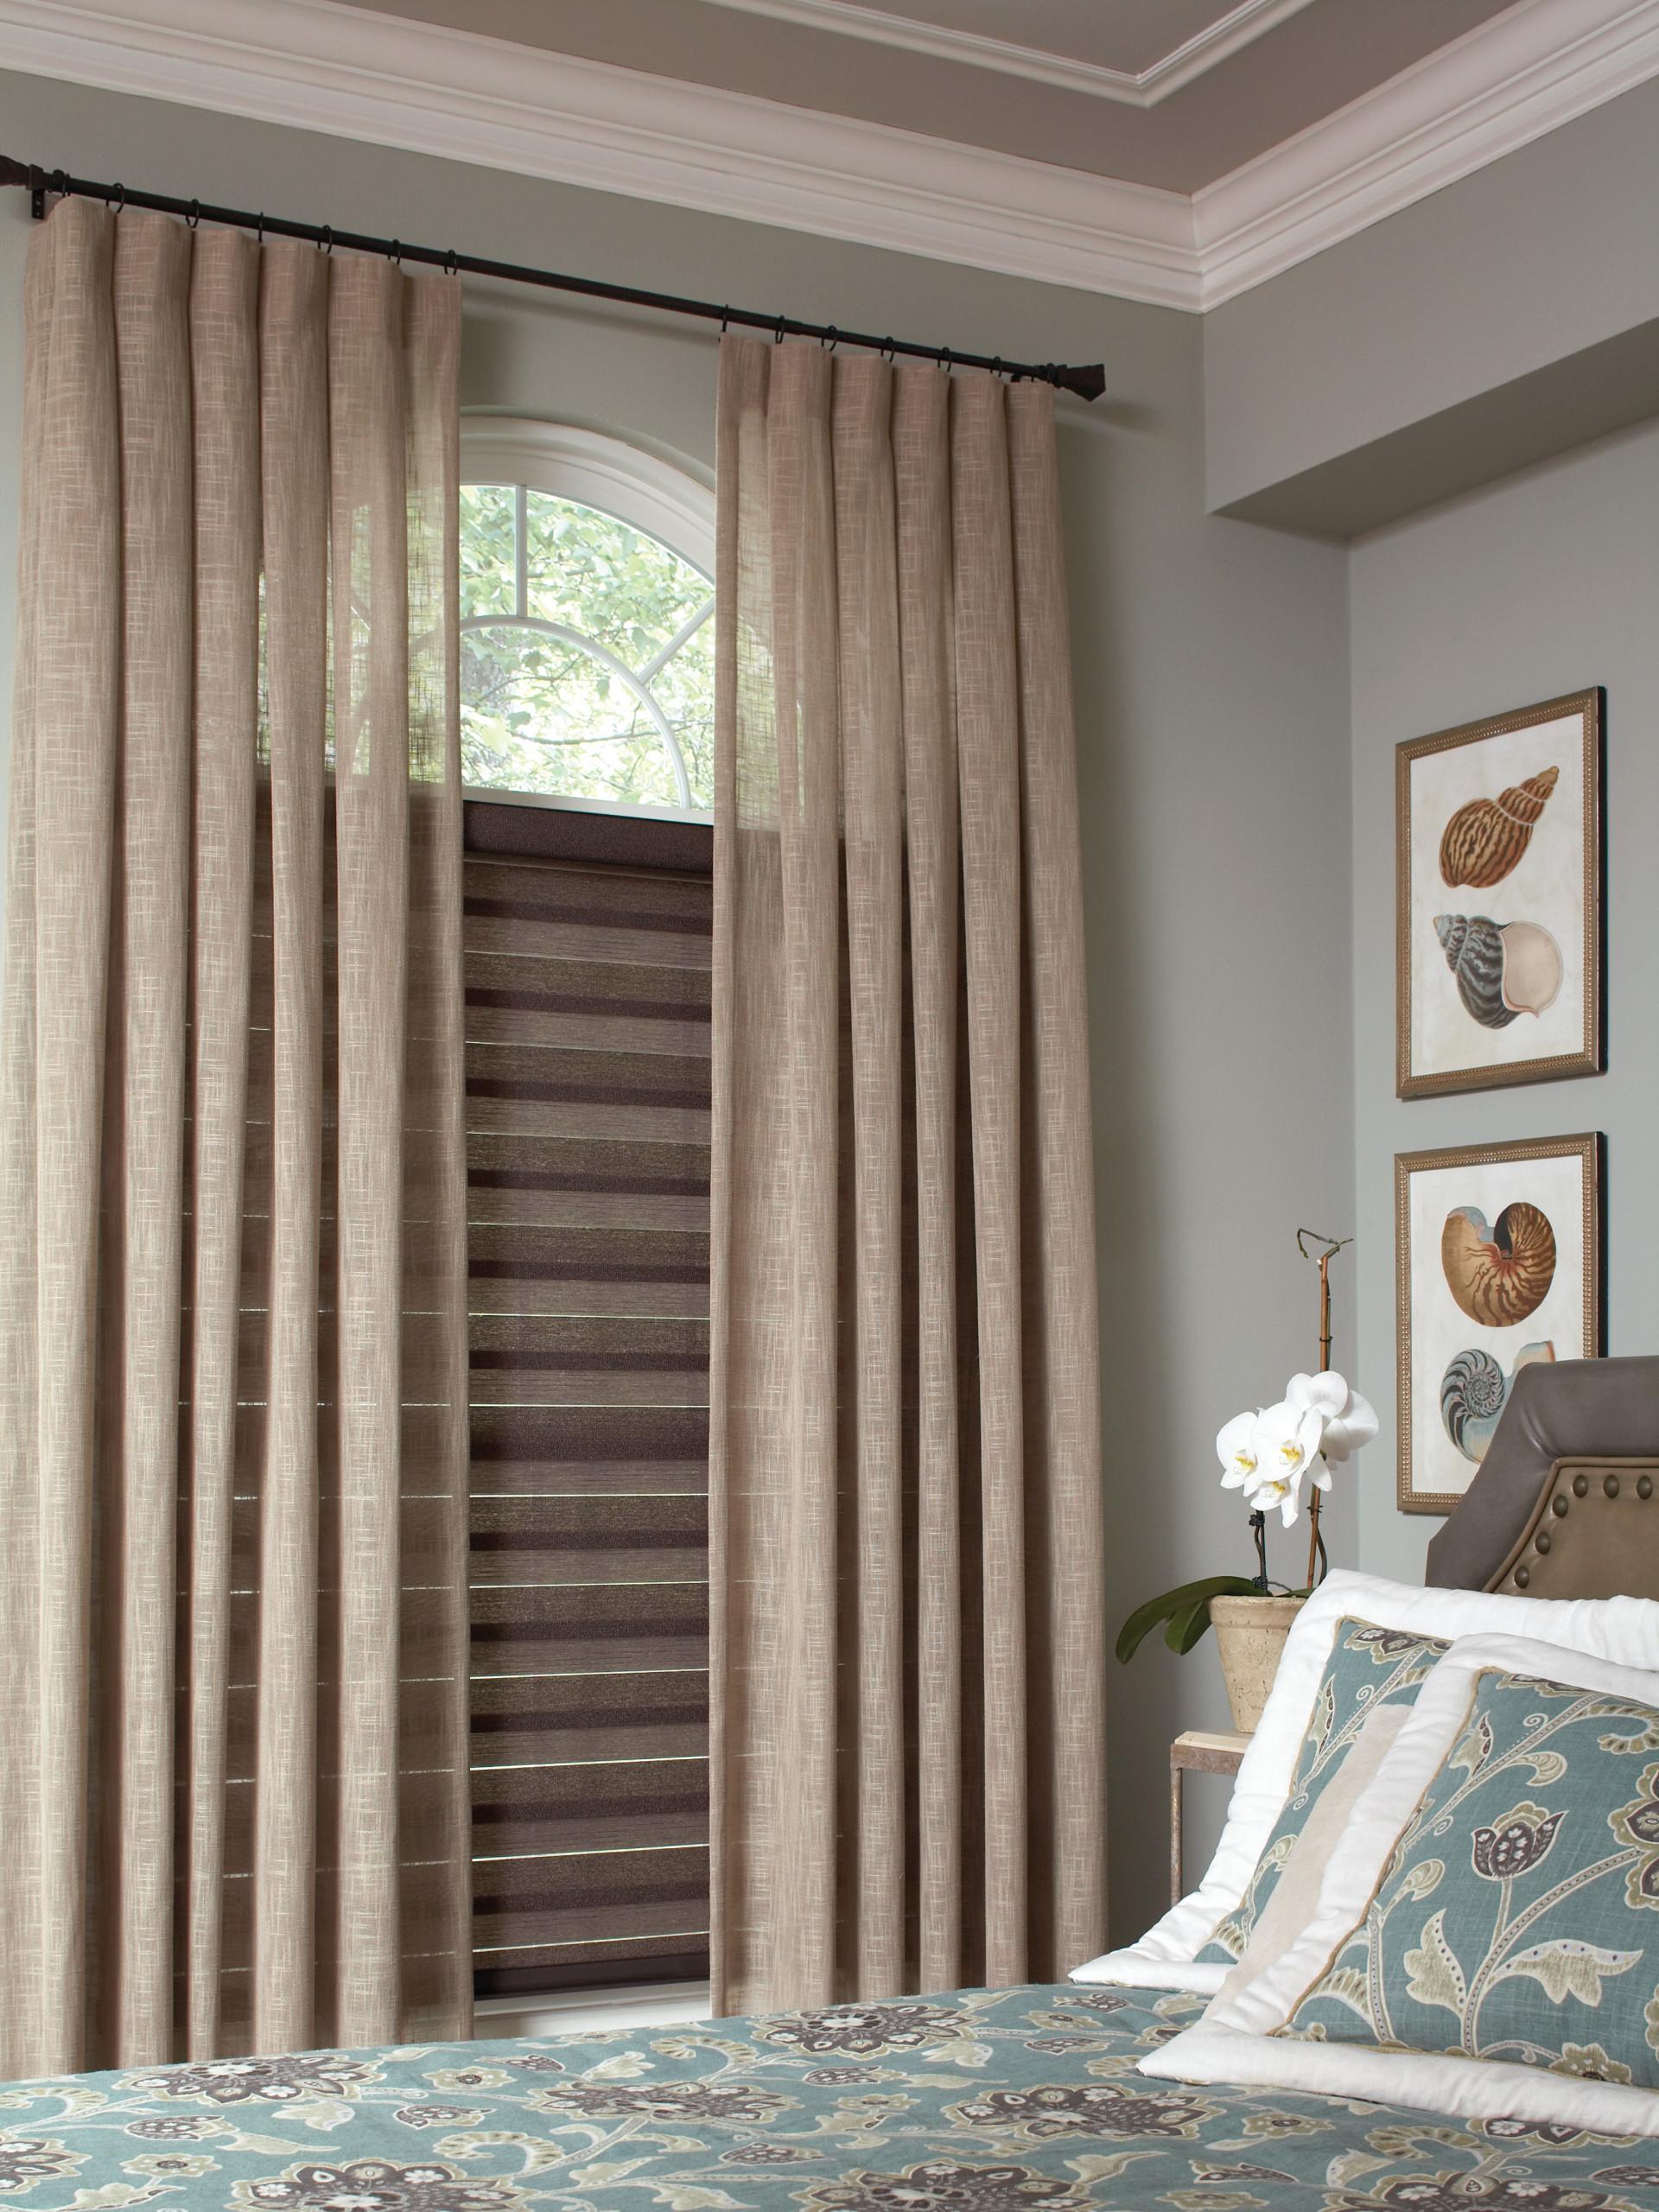 Bedroom Window Treatment Houzz